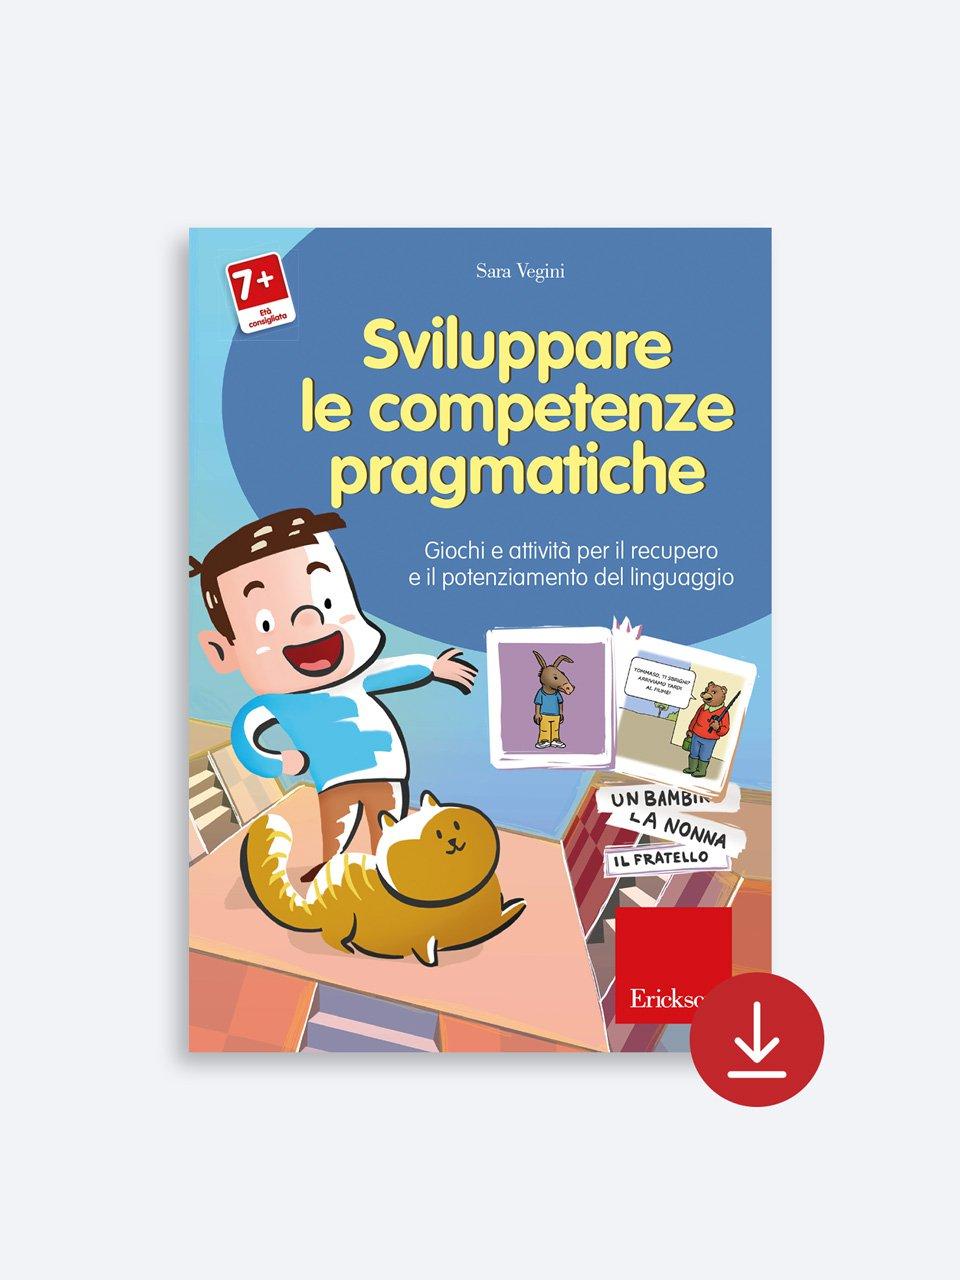 Sviluppare le competenze pragmatiche - Volume 1 - My First Word Games - App e software - Erickson 2